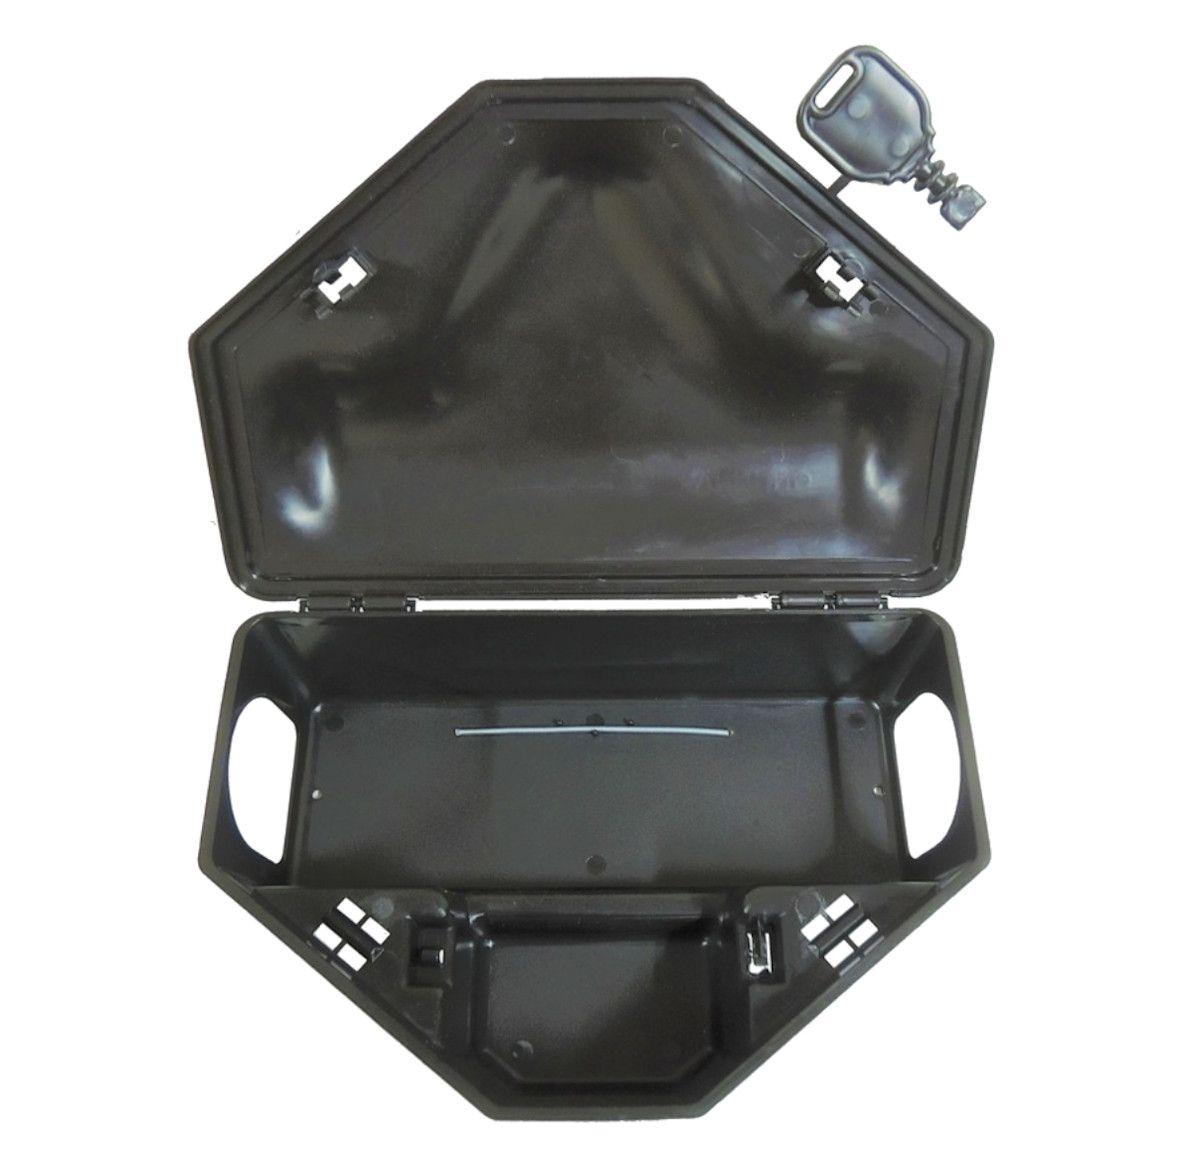 Kit 72 Porta Isca Com 2 Chaves - Duplo Travamento